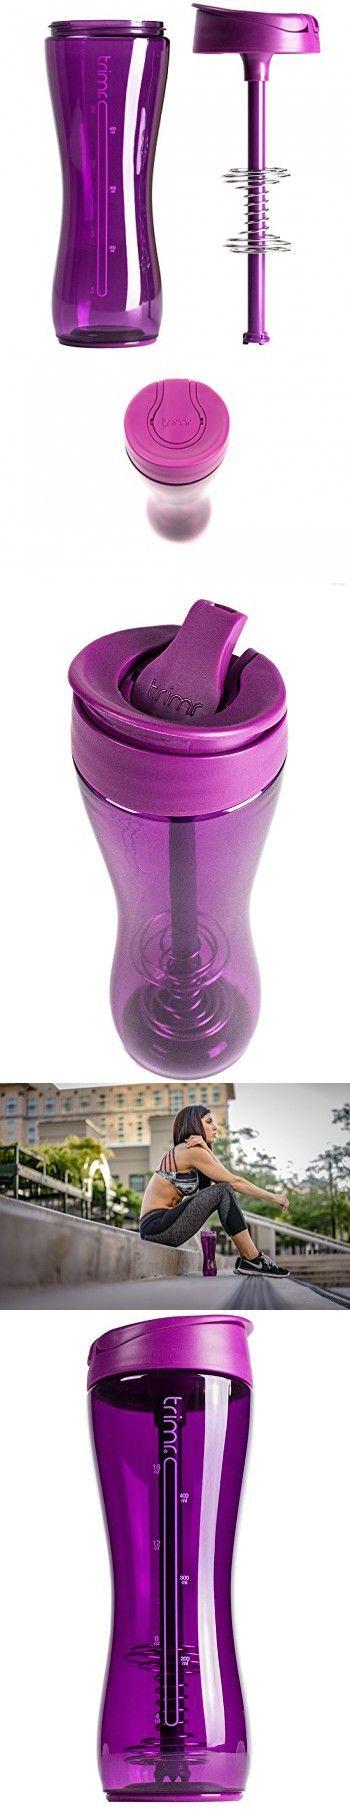 TRIMR Duo 24oz Plum - Shaker Bottle Tritan BPA-Free Straw Hydration Shaker Cup Protein Shakes